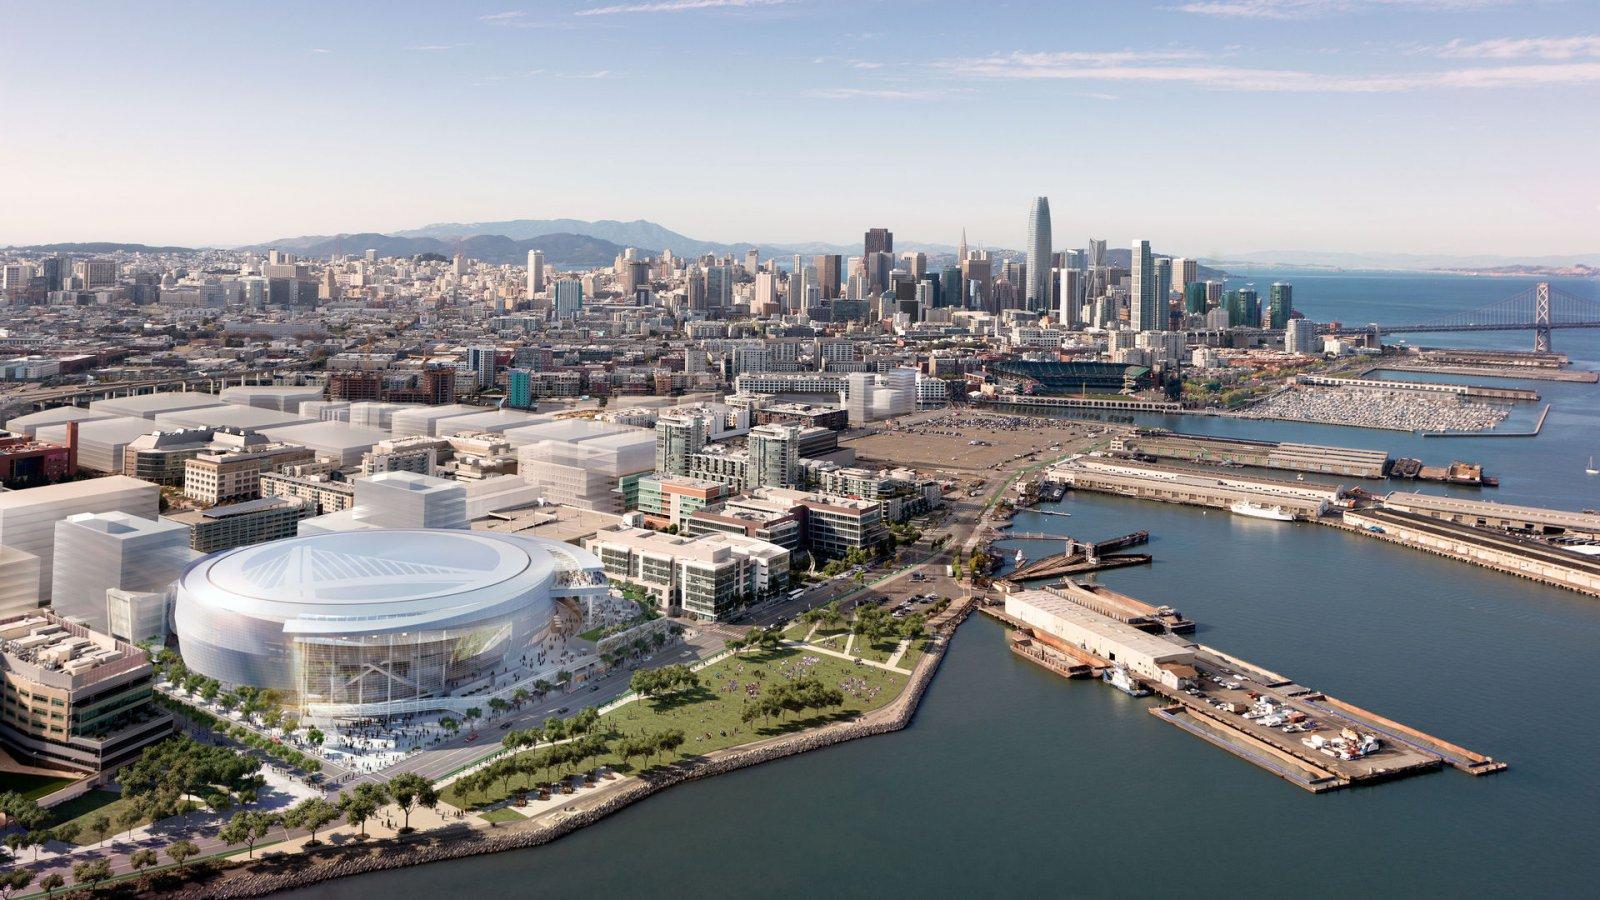 San Francisco Arena - Southwest Aerial